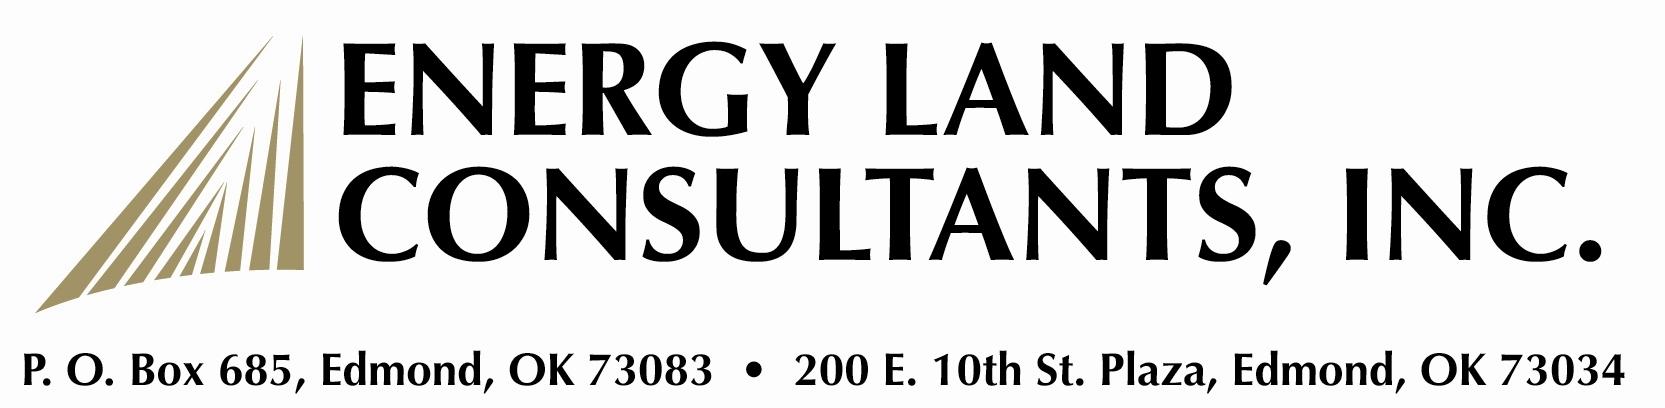 Energy Land Consultants, Inc.